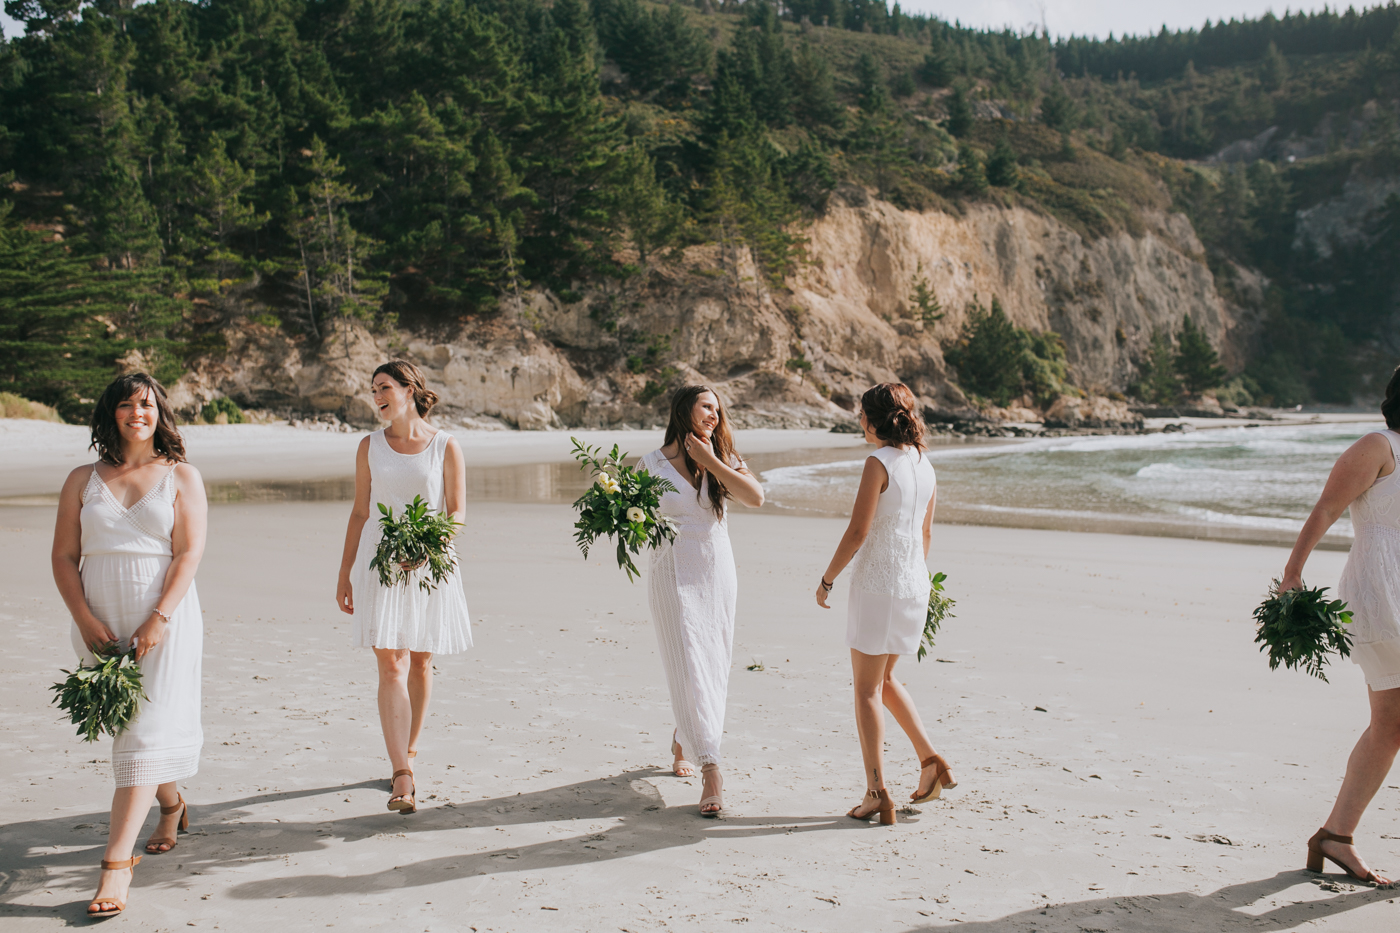 Ariana & Tim - Dunedin, New Zealand Wedding - Destination Wedding - Samantha Heather Photography-130.jpg